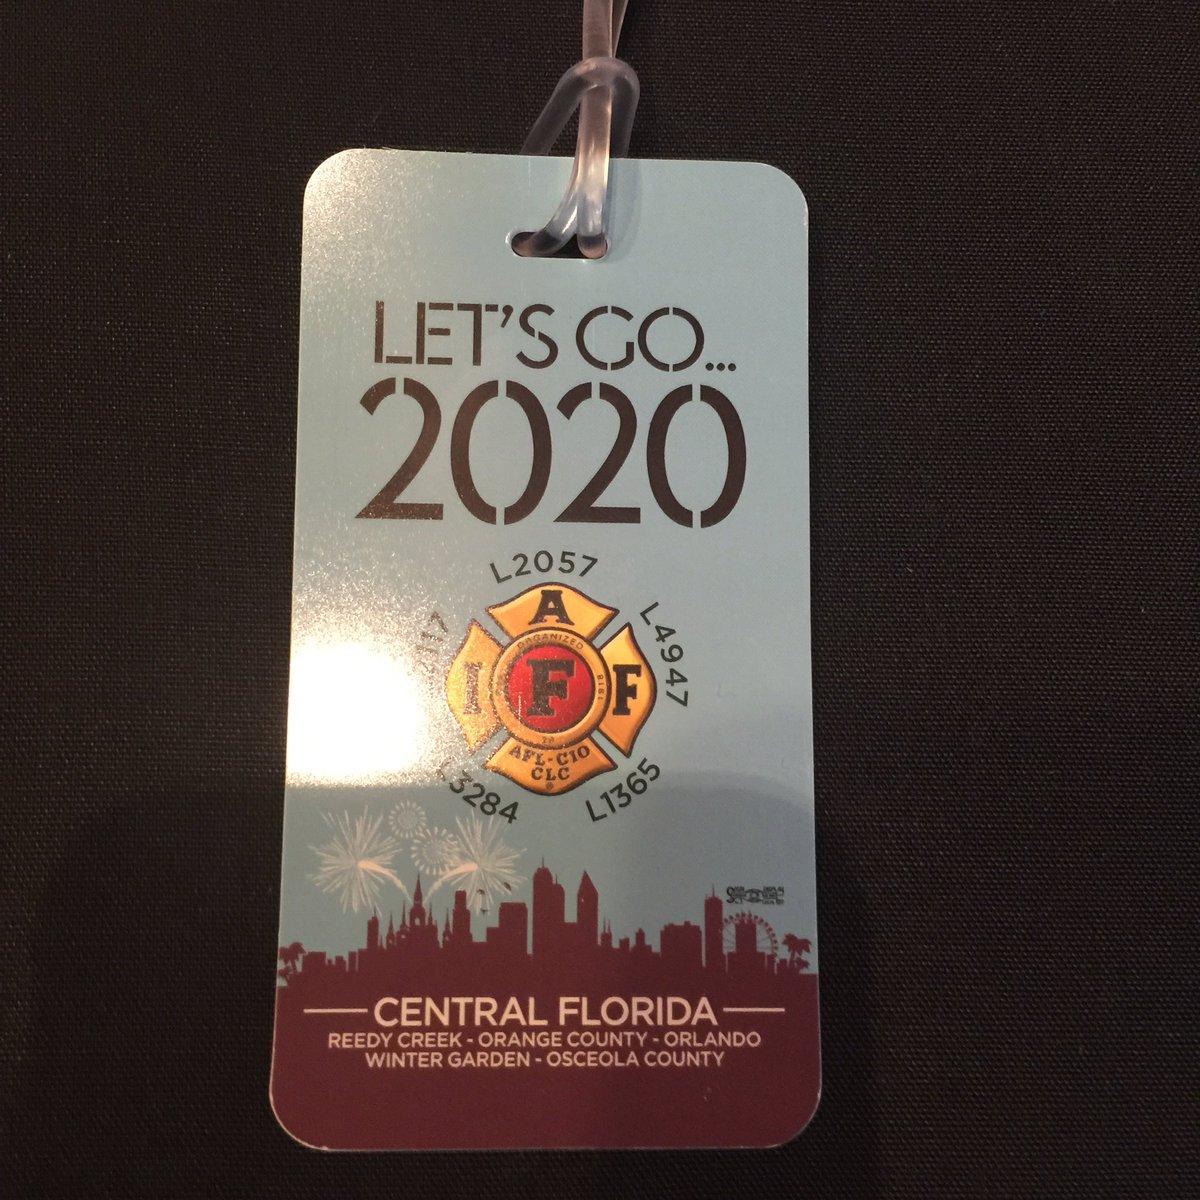 IAFF 2020 Florida (@IAFF2020Florida) | Twitter